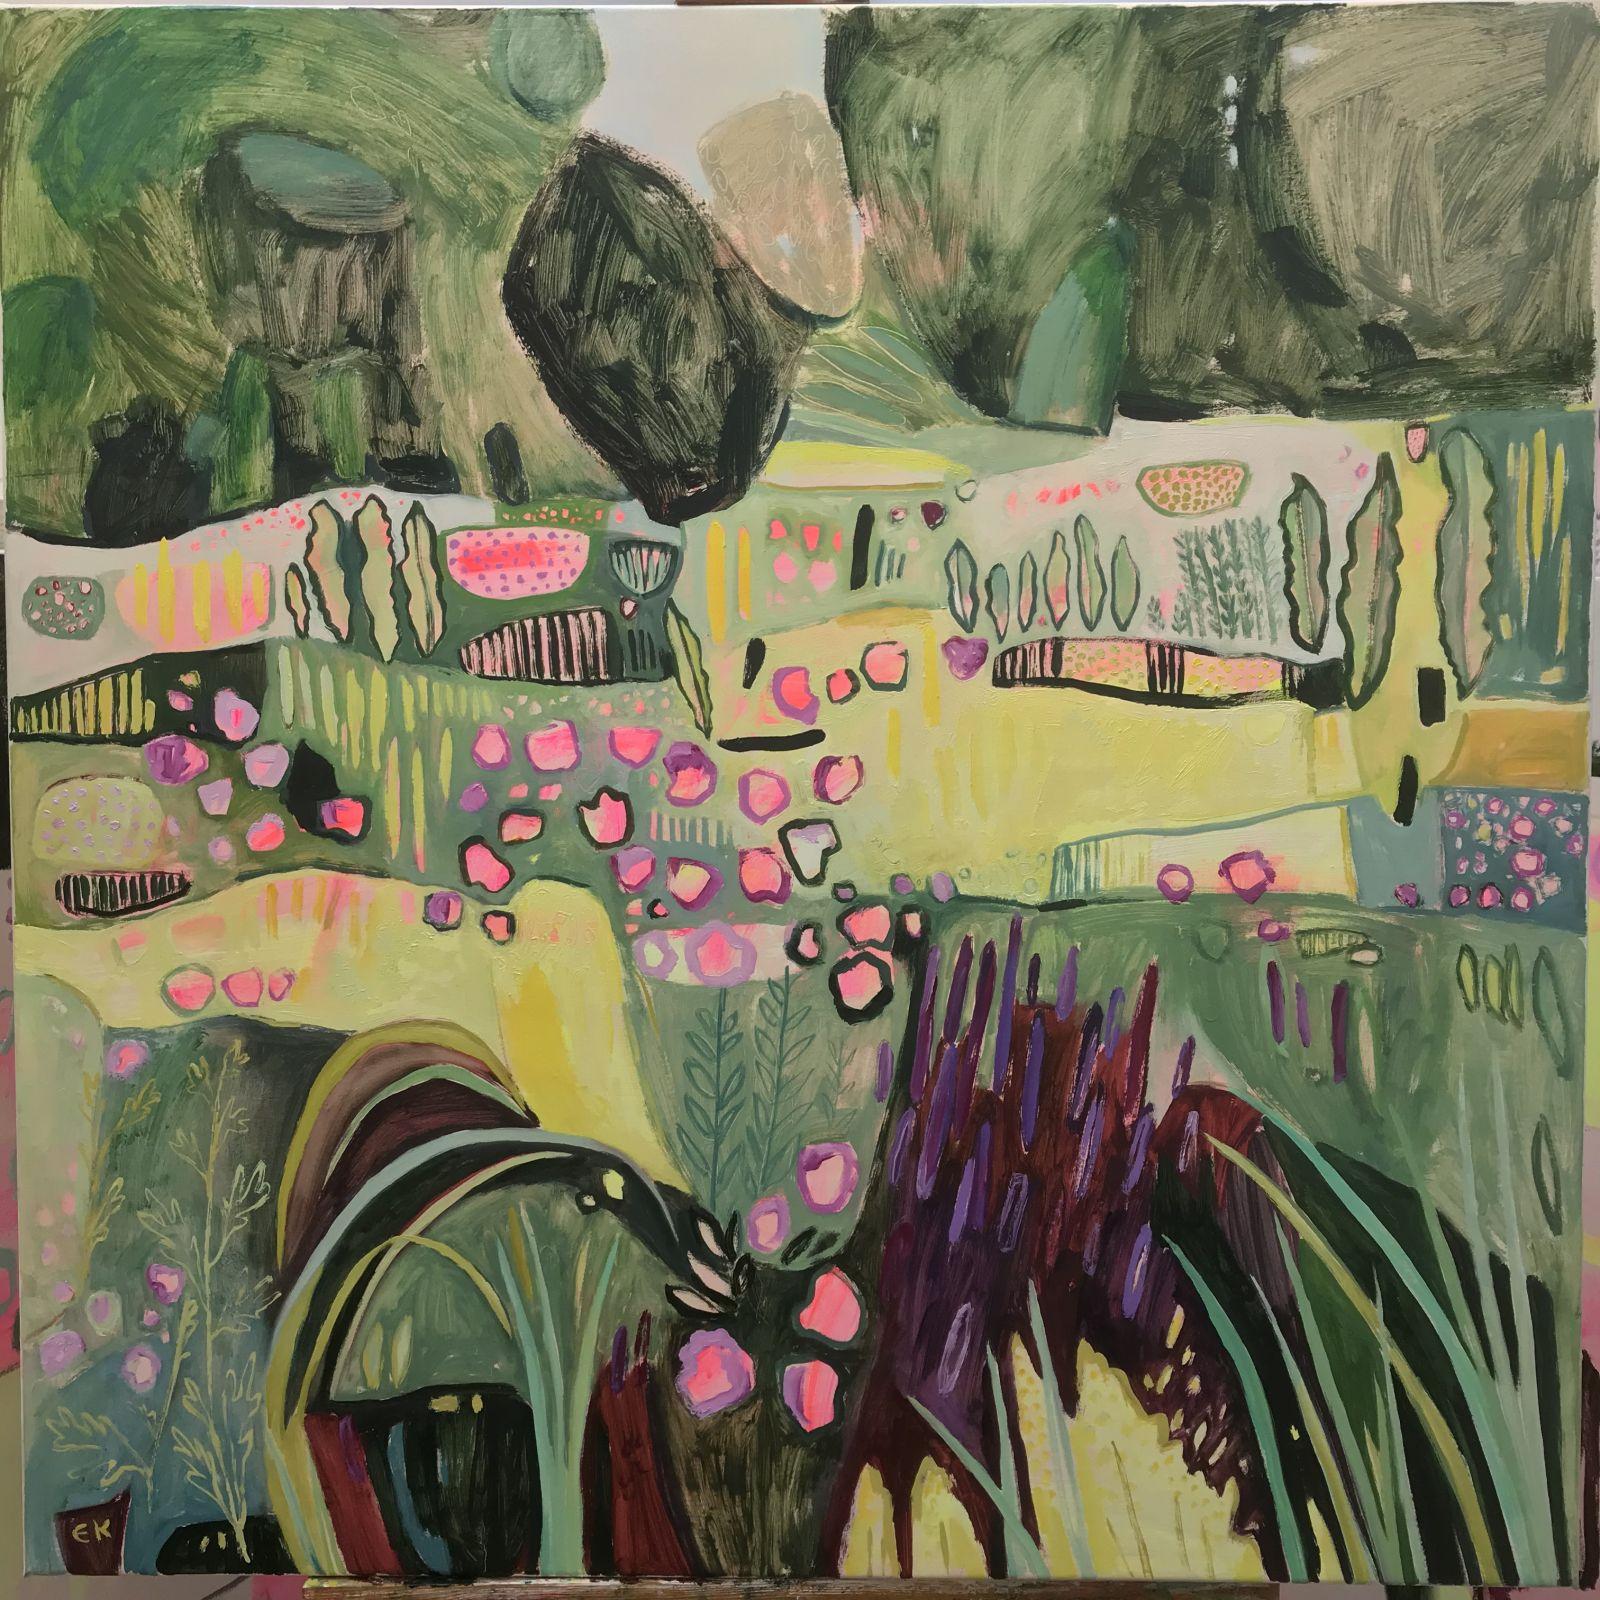 Elaine Kazimierczuk: Re-Fresh - Pink, Yellow, Purple in the Merton Beds